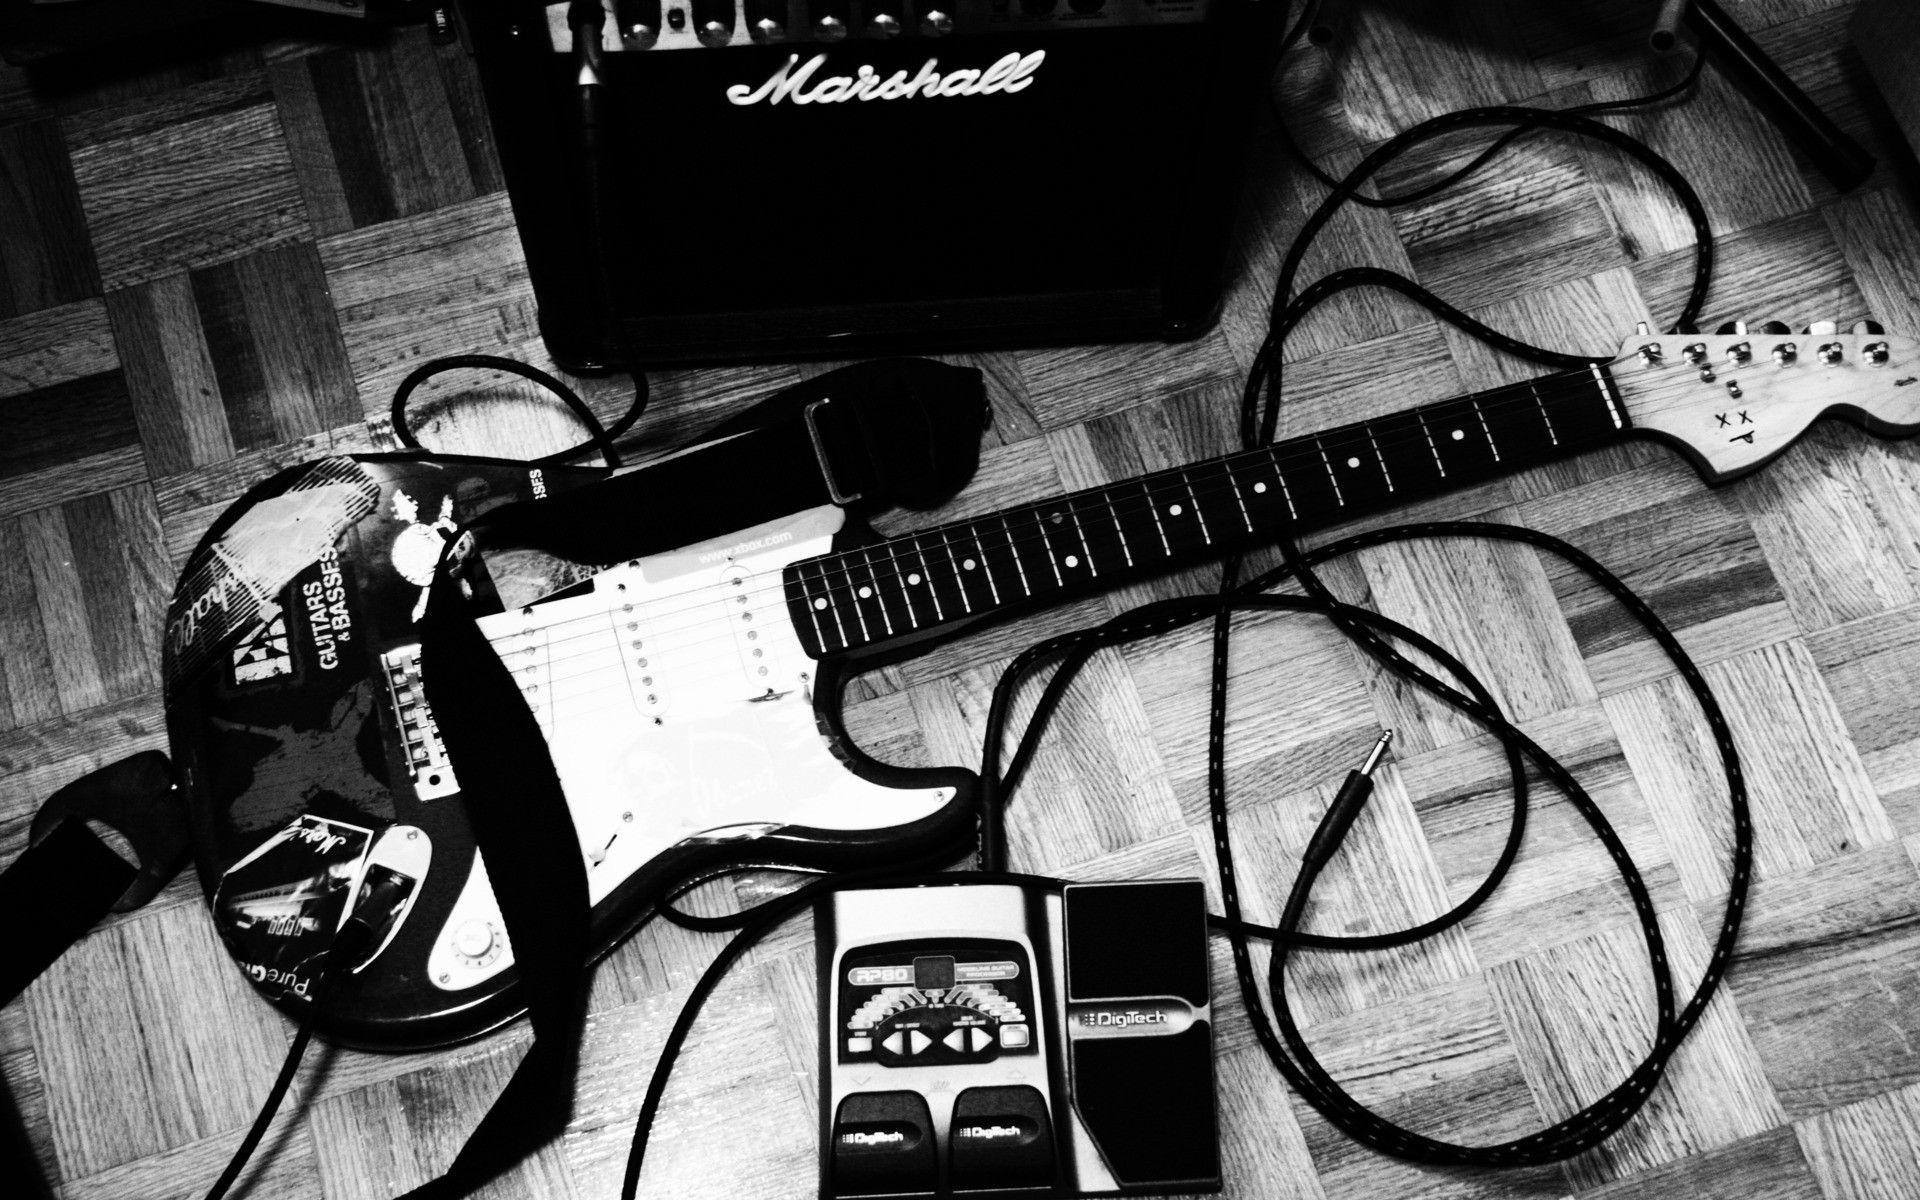 Wallpapers de Guitarras – Identi | Guitarra, Instrumento musical de cuerda.  | Pinterest | Wallpaper